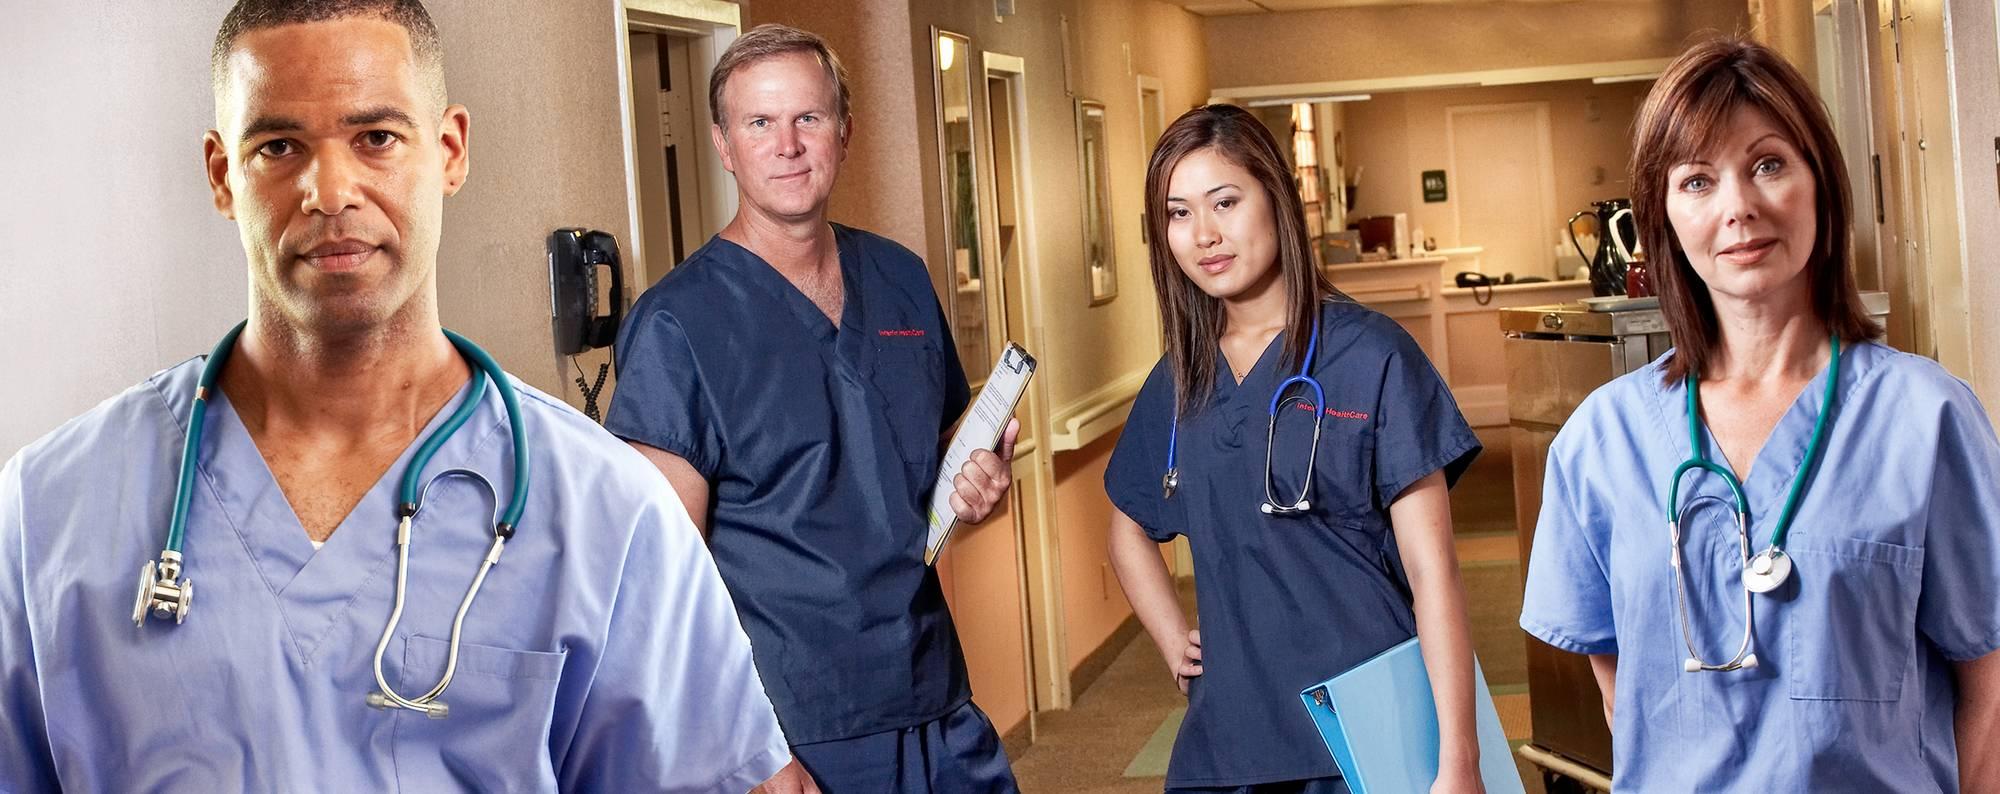 medical-comp.jpg